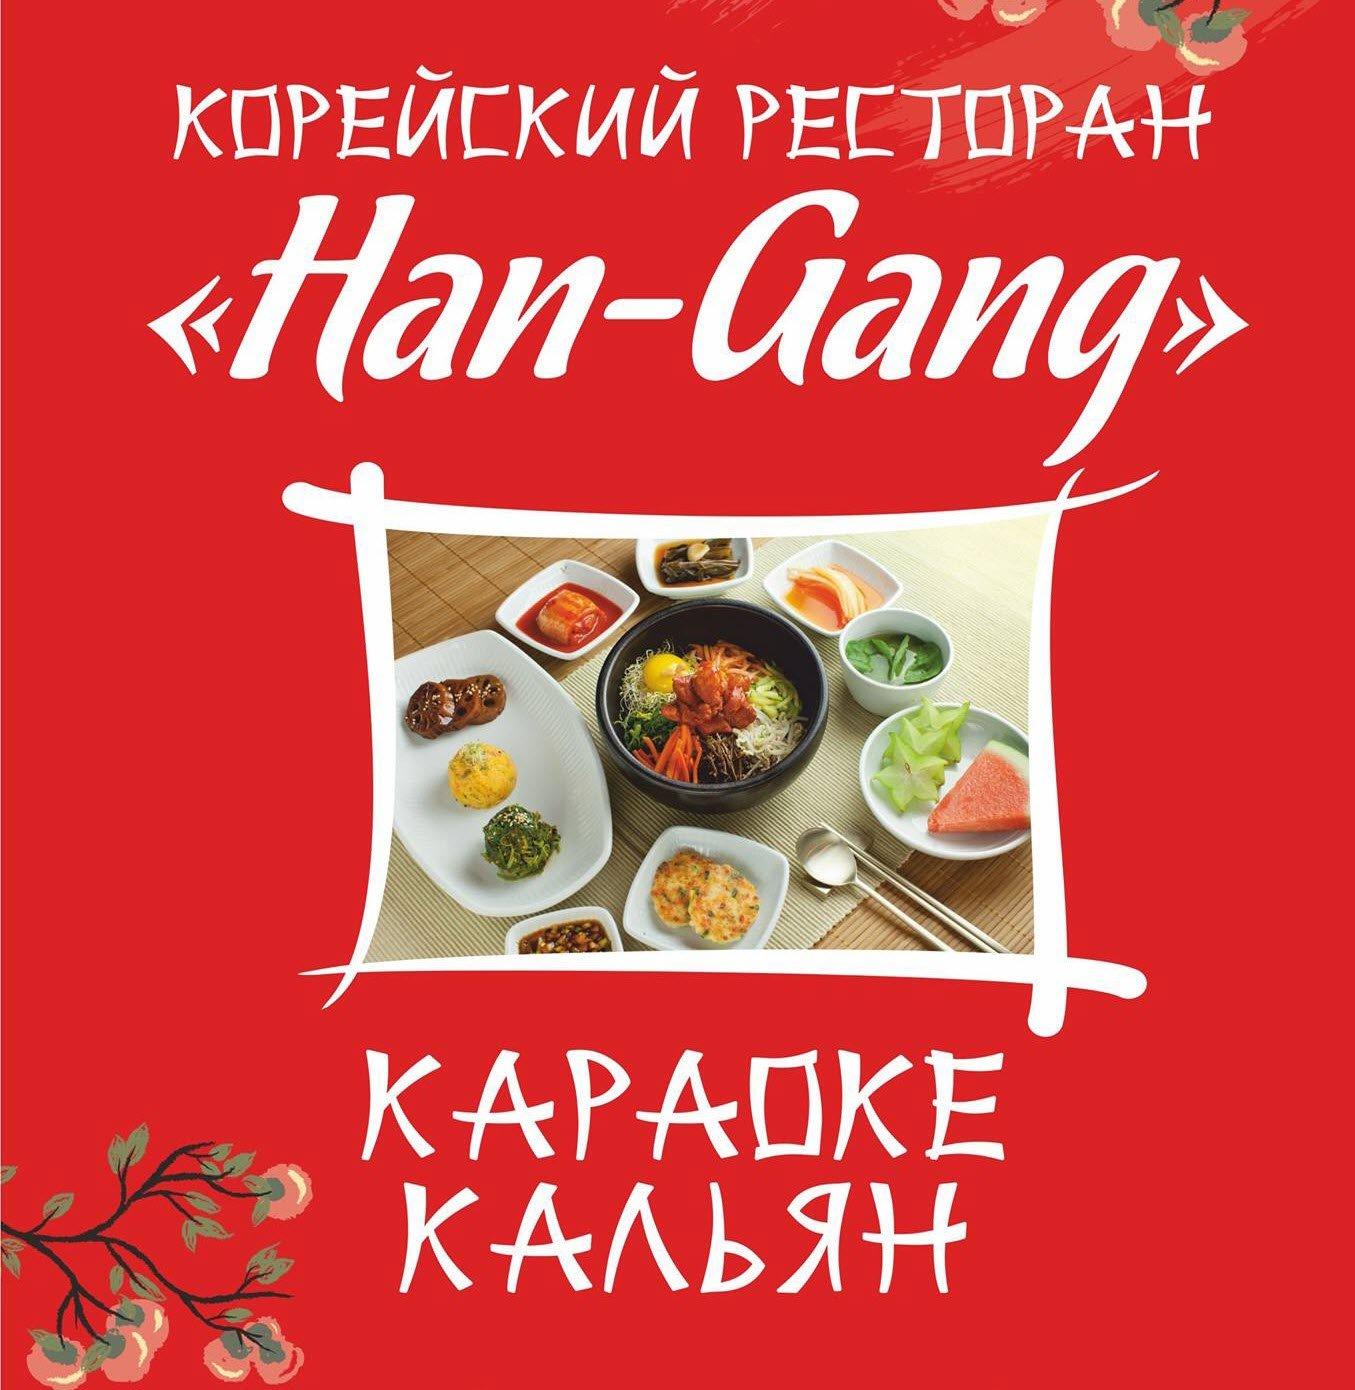 Ресторан Хан-Ганг / Restaurant Han-Gang